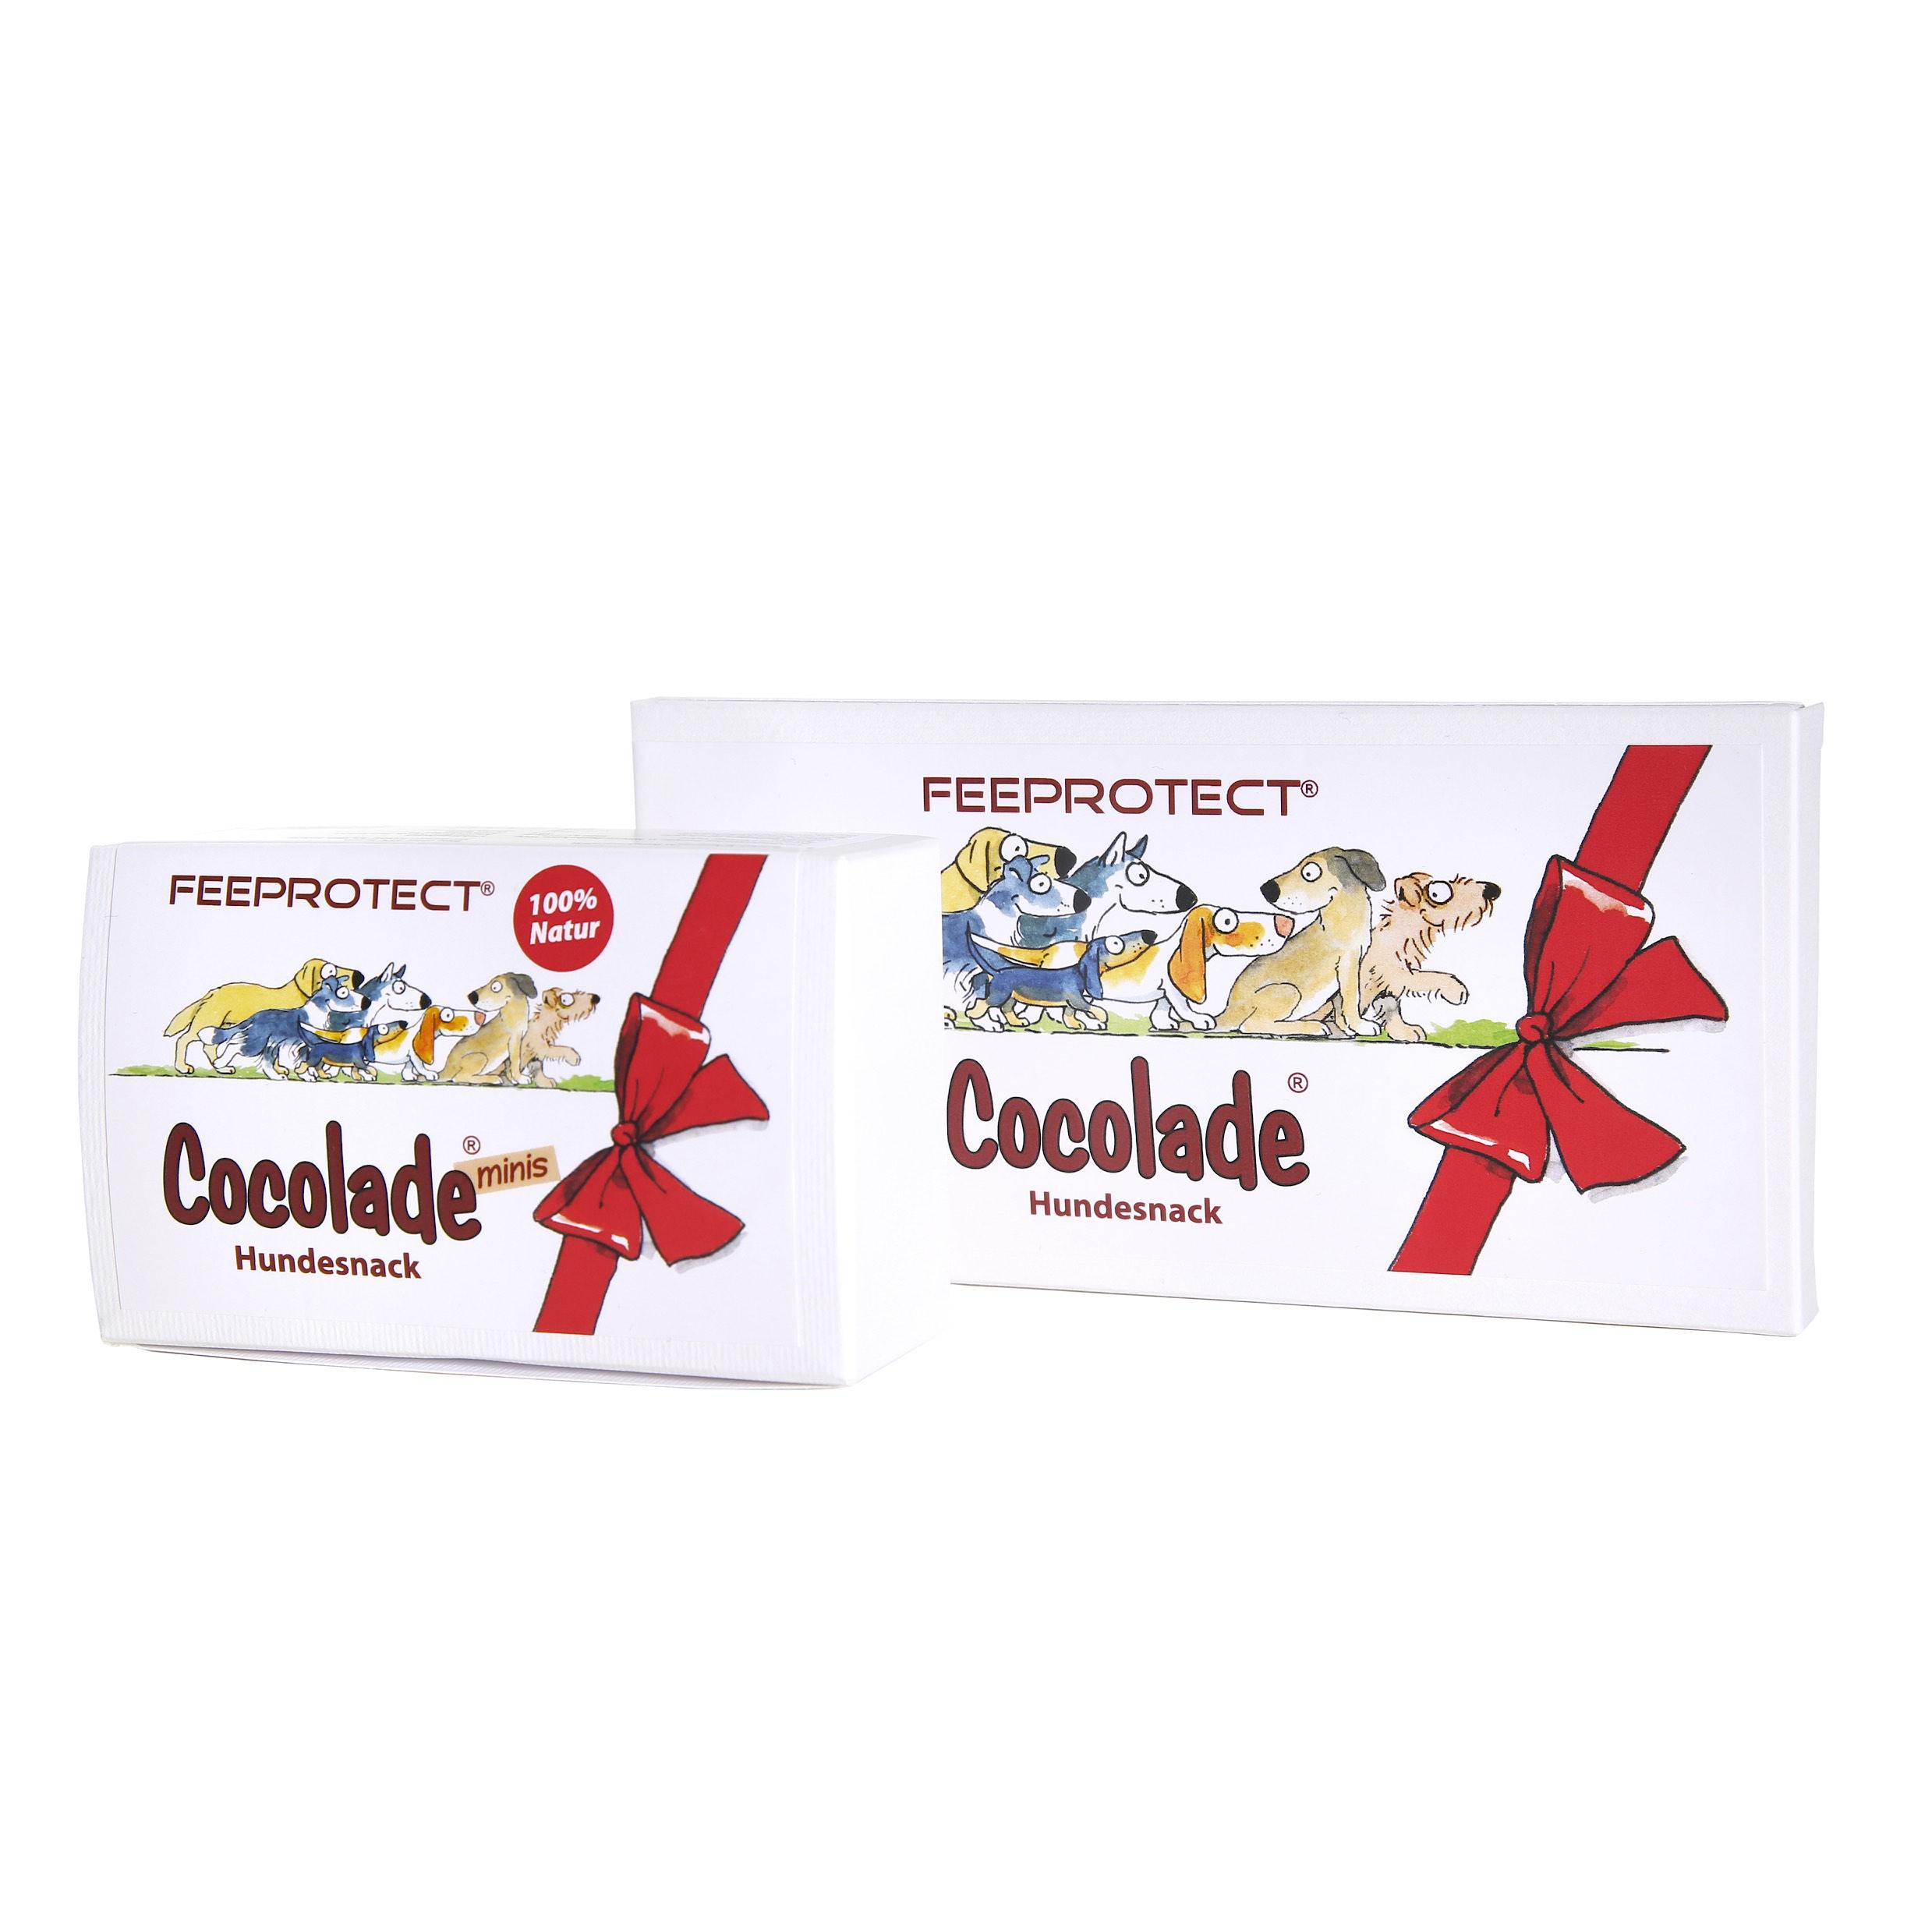 Feeprotect Cocolade ® minis